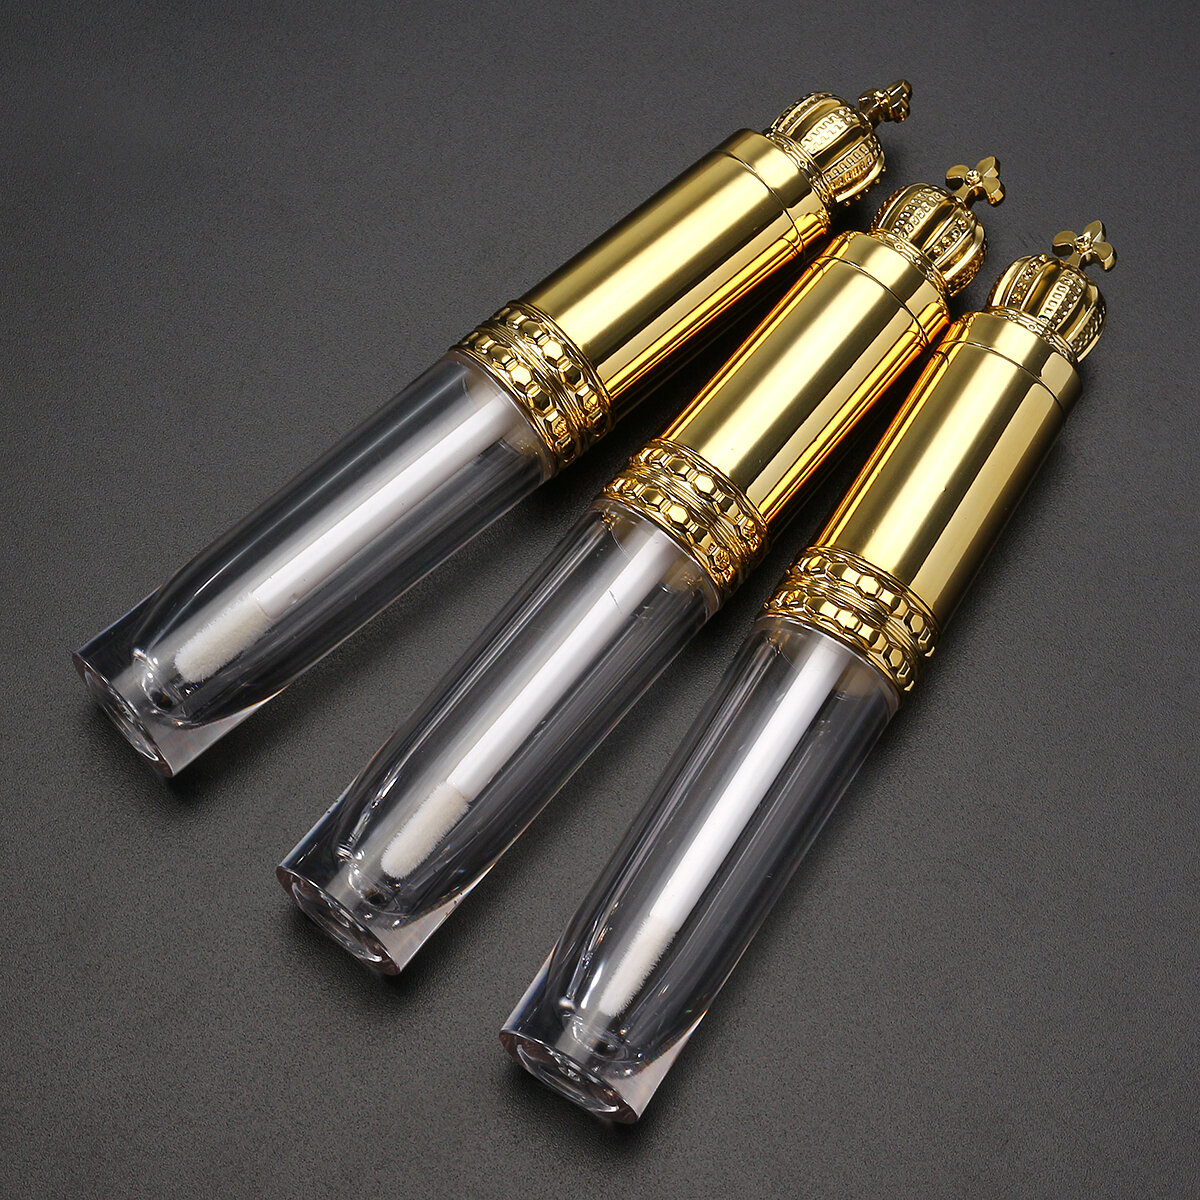 8 ML Empty Liquid Lip Gloss Tube Refillable Queen Gold Crown Container Case Eyelash Lipstick Bottle